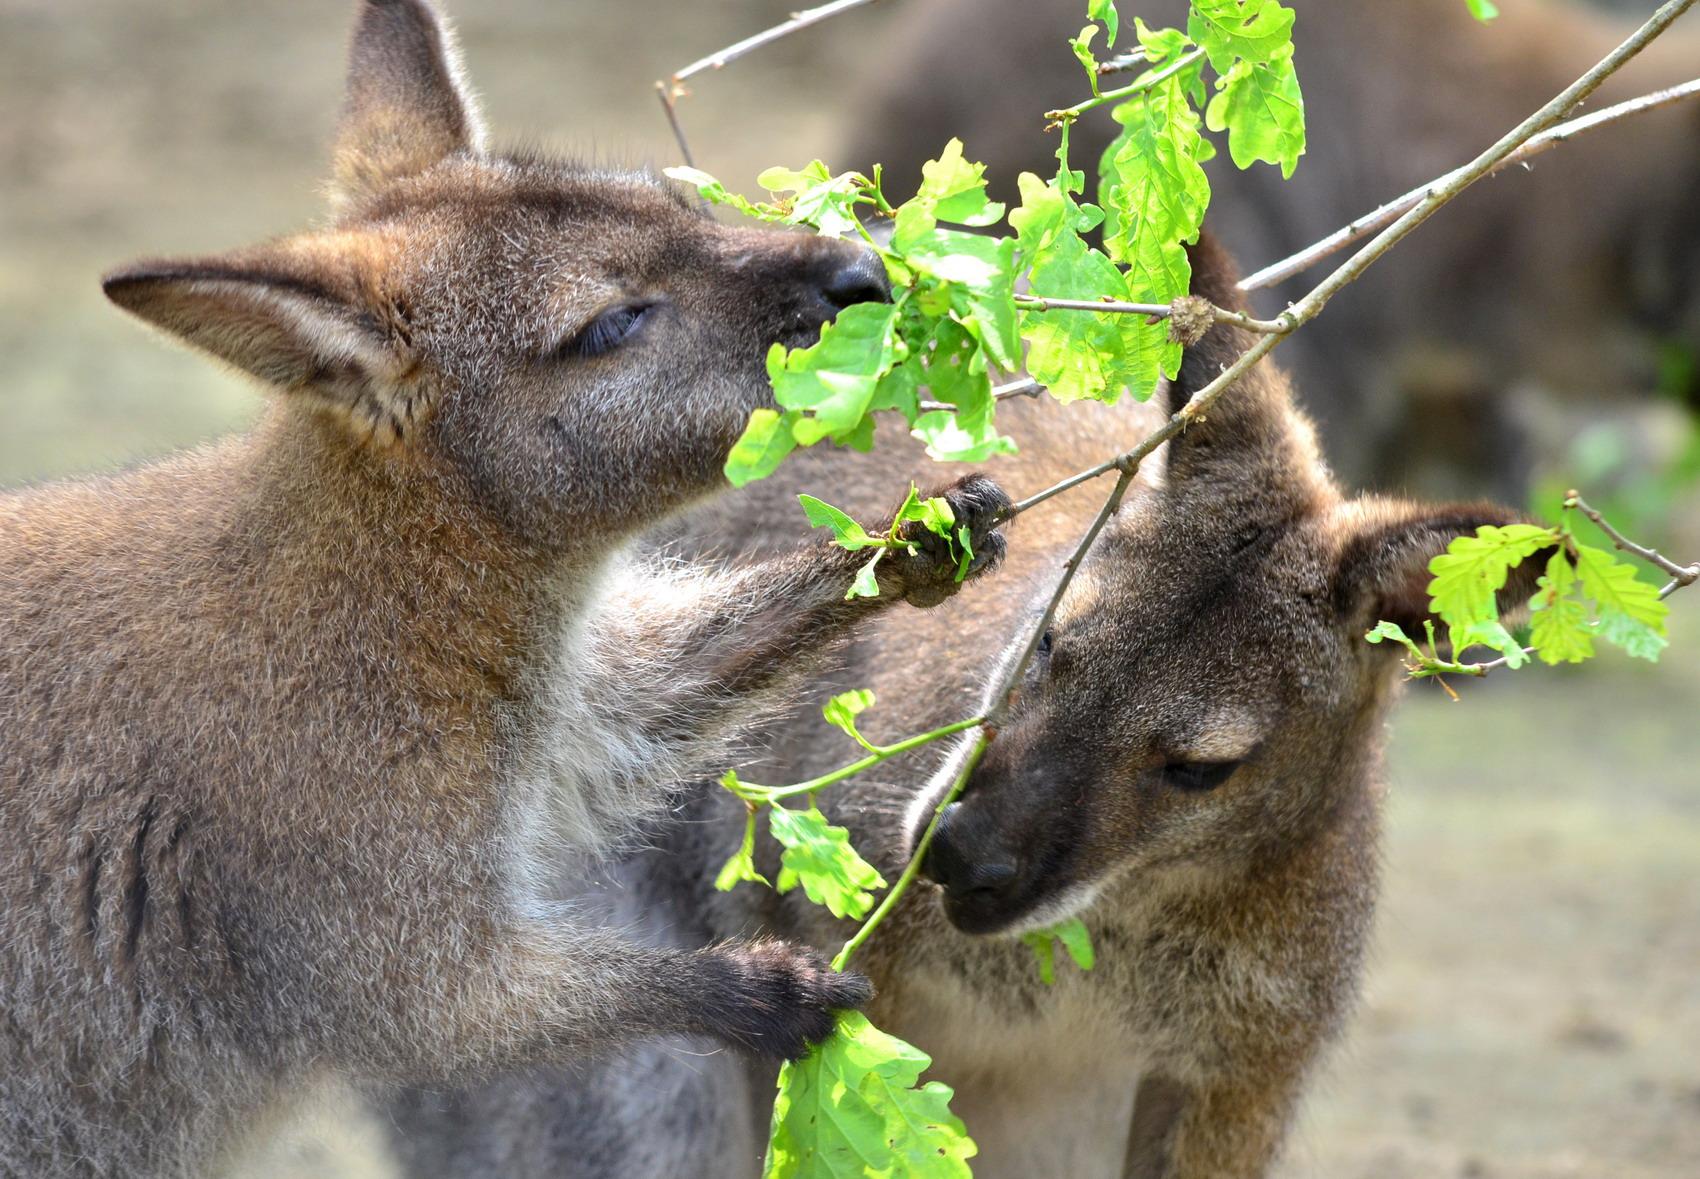 Kangoo Jumps - legyél te is kenguru!